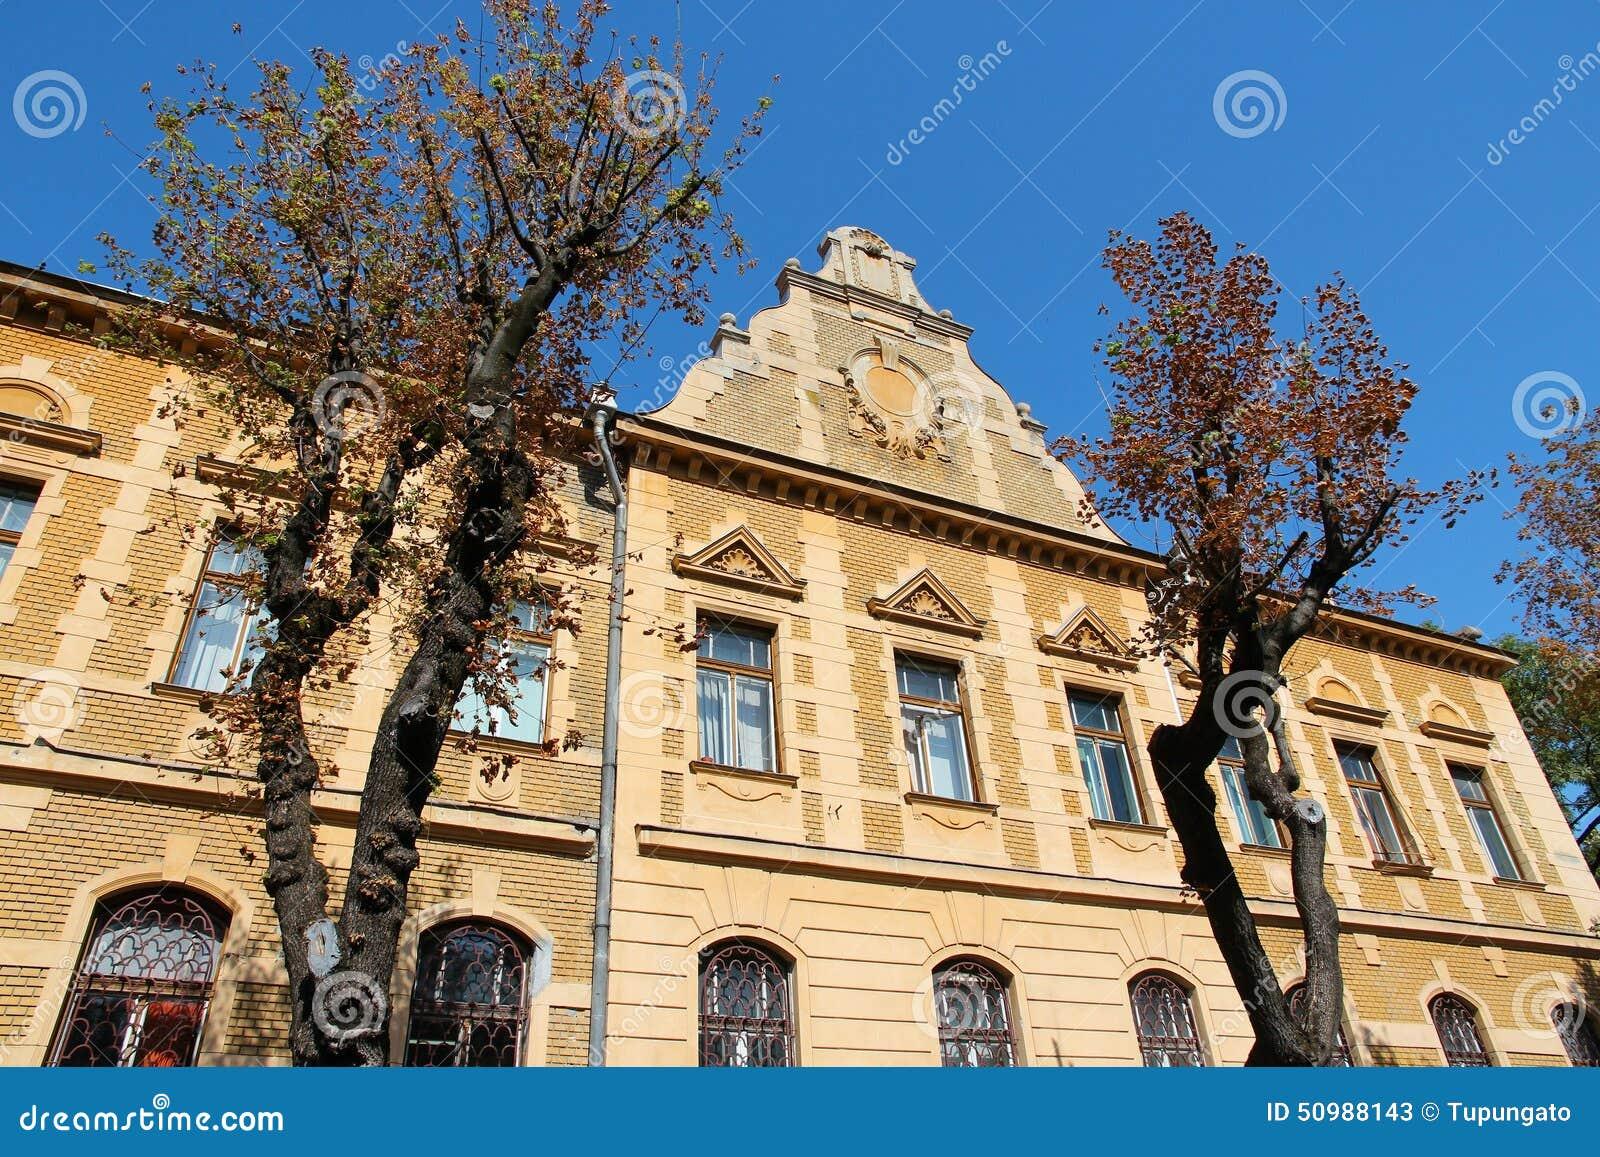 When Romania opened a post office in the Ottoman Empire